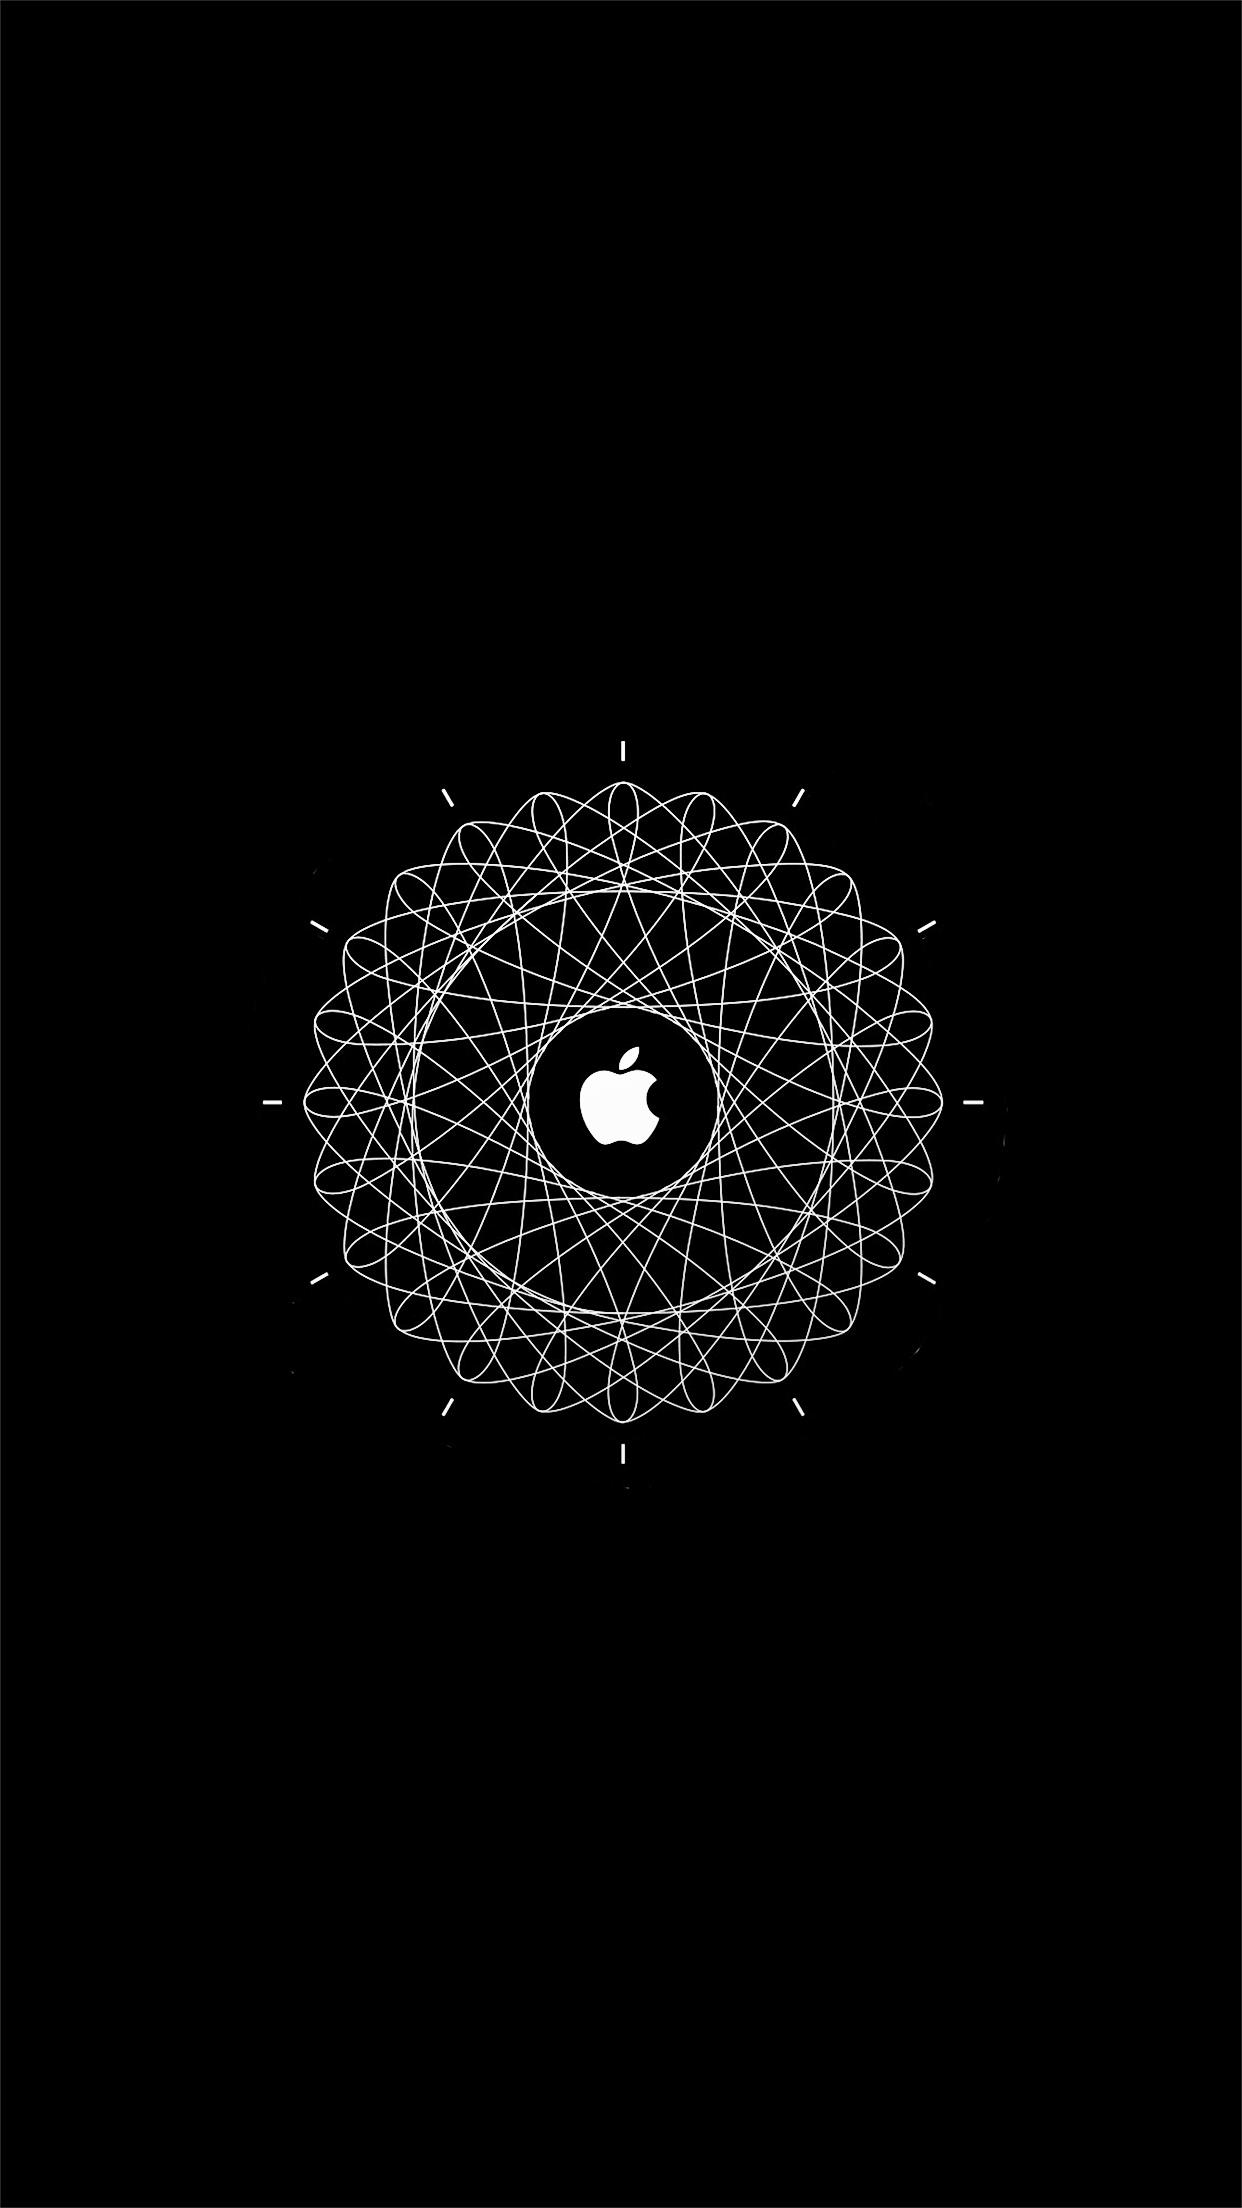 IanFuchs Apple Watch Animation 3 Wallpaper for iPhone X, 8 ...